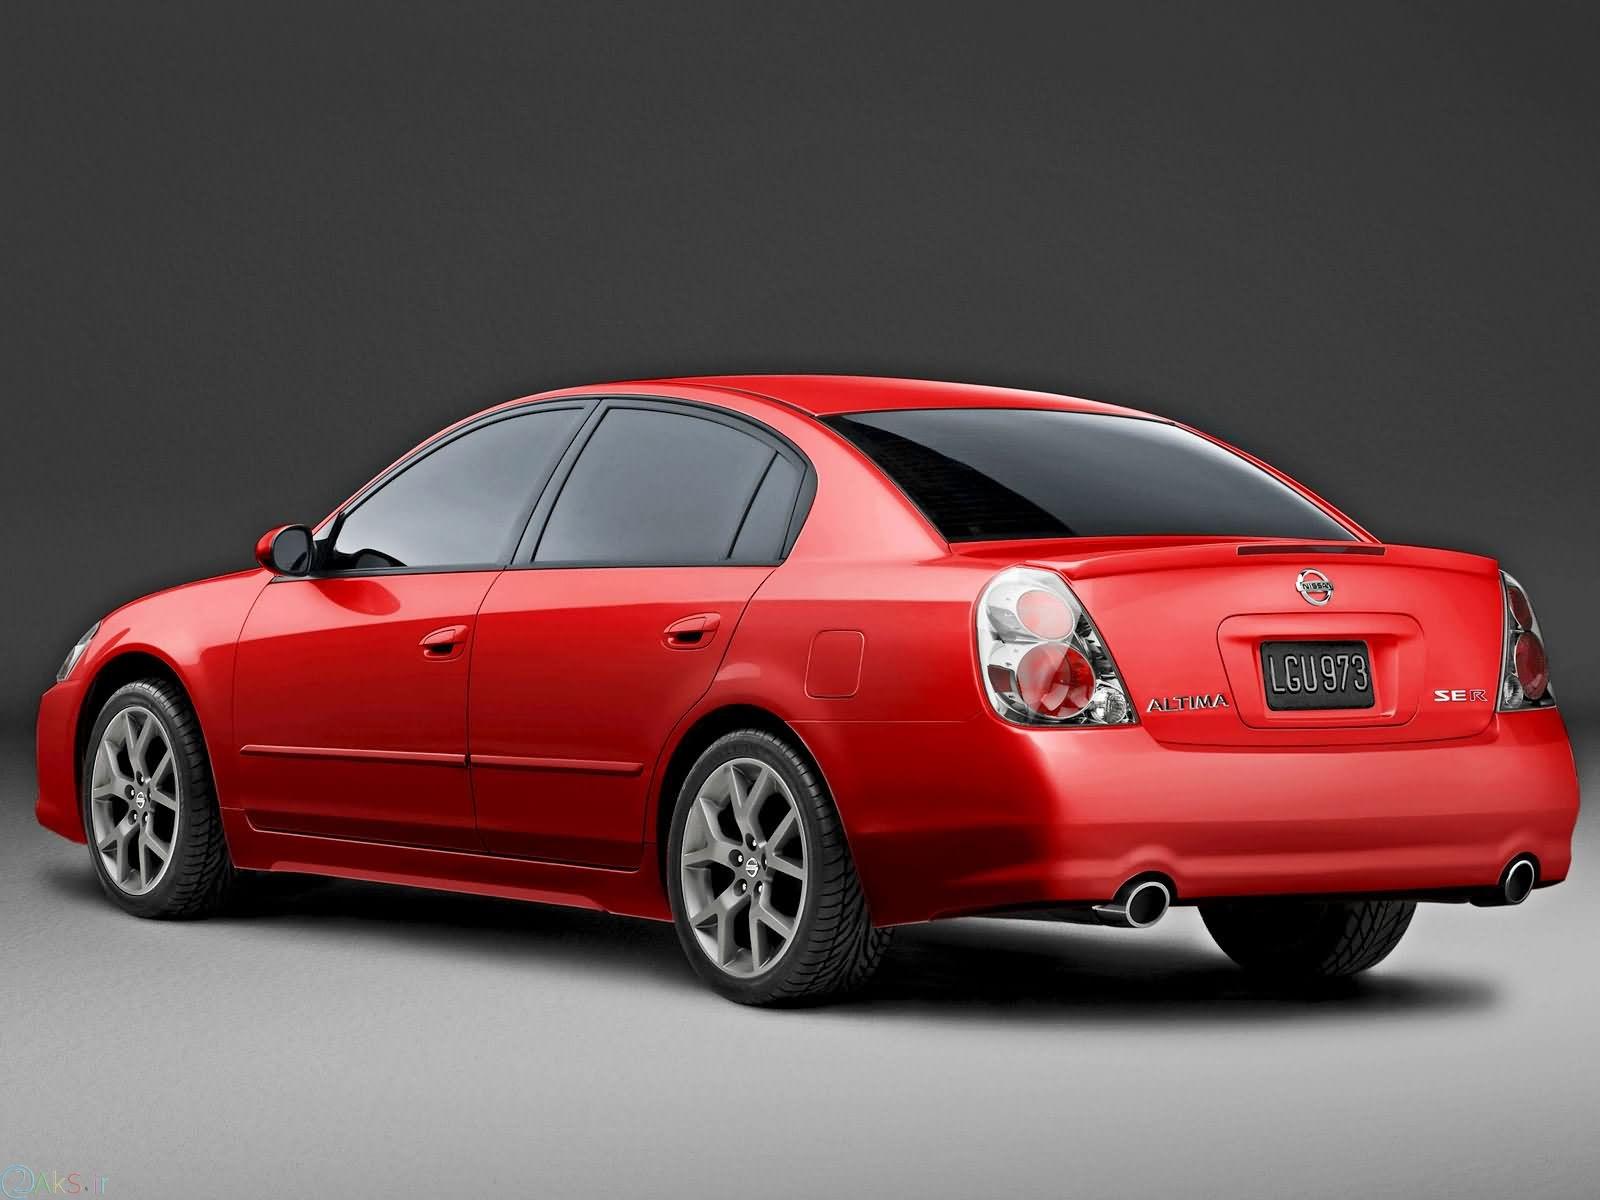 Nissan Altima قرمز